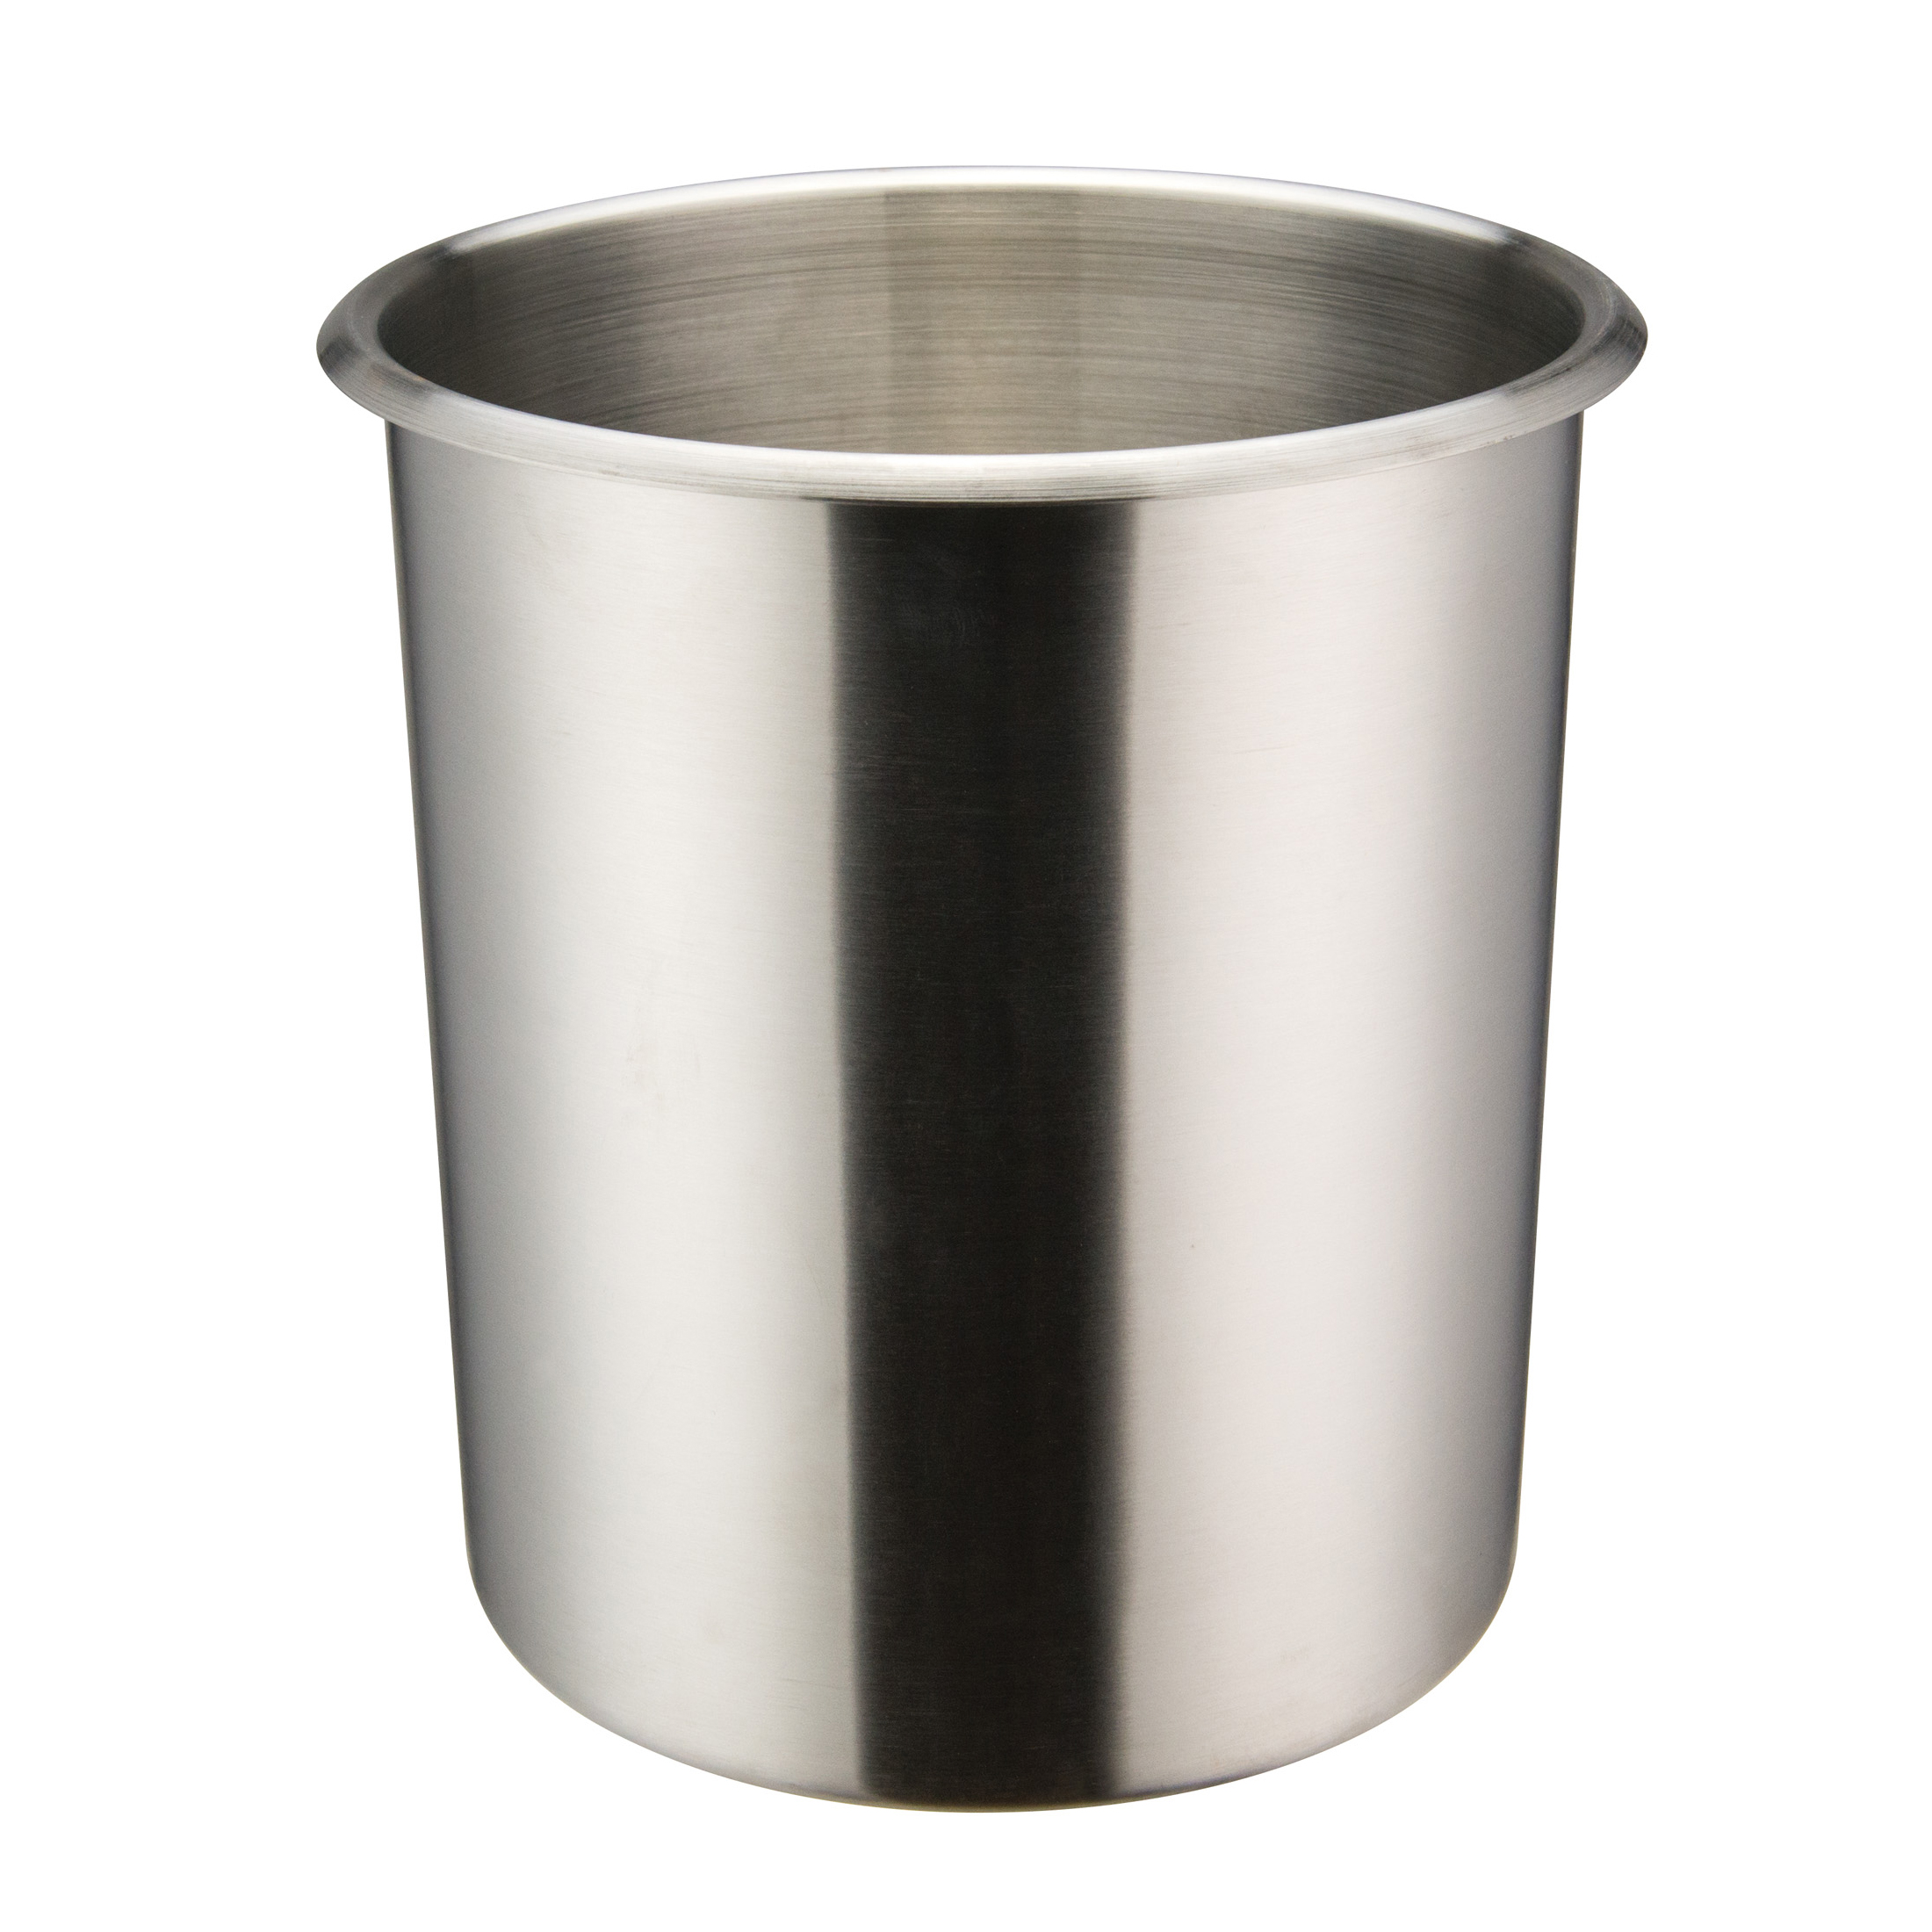 2400-19 Winco BAM-6 bain marie pot